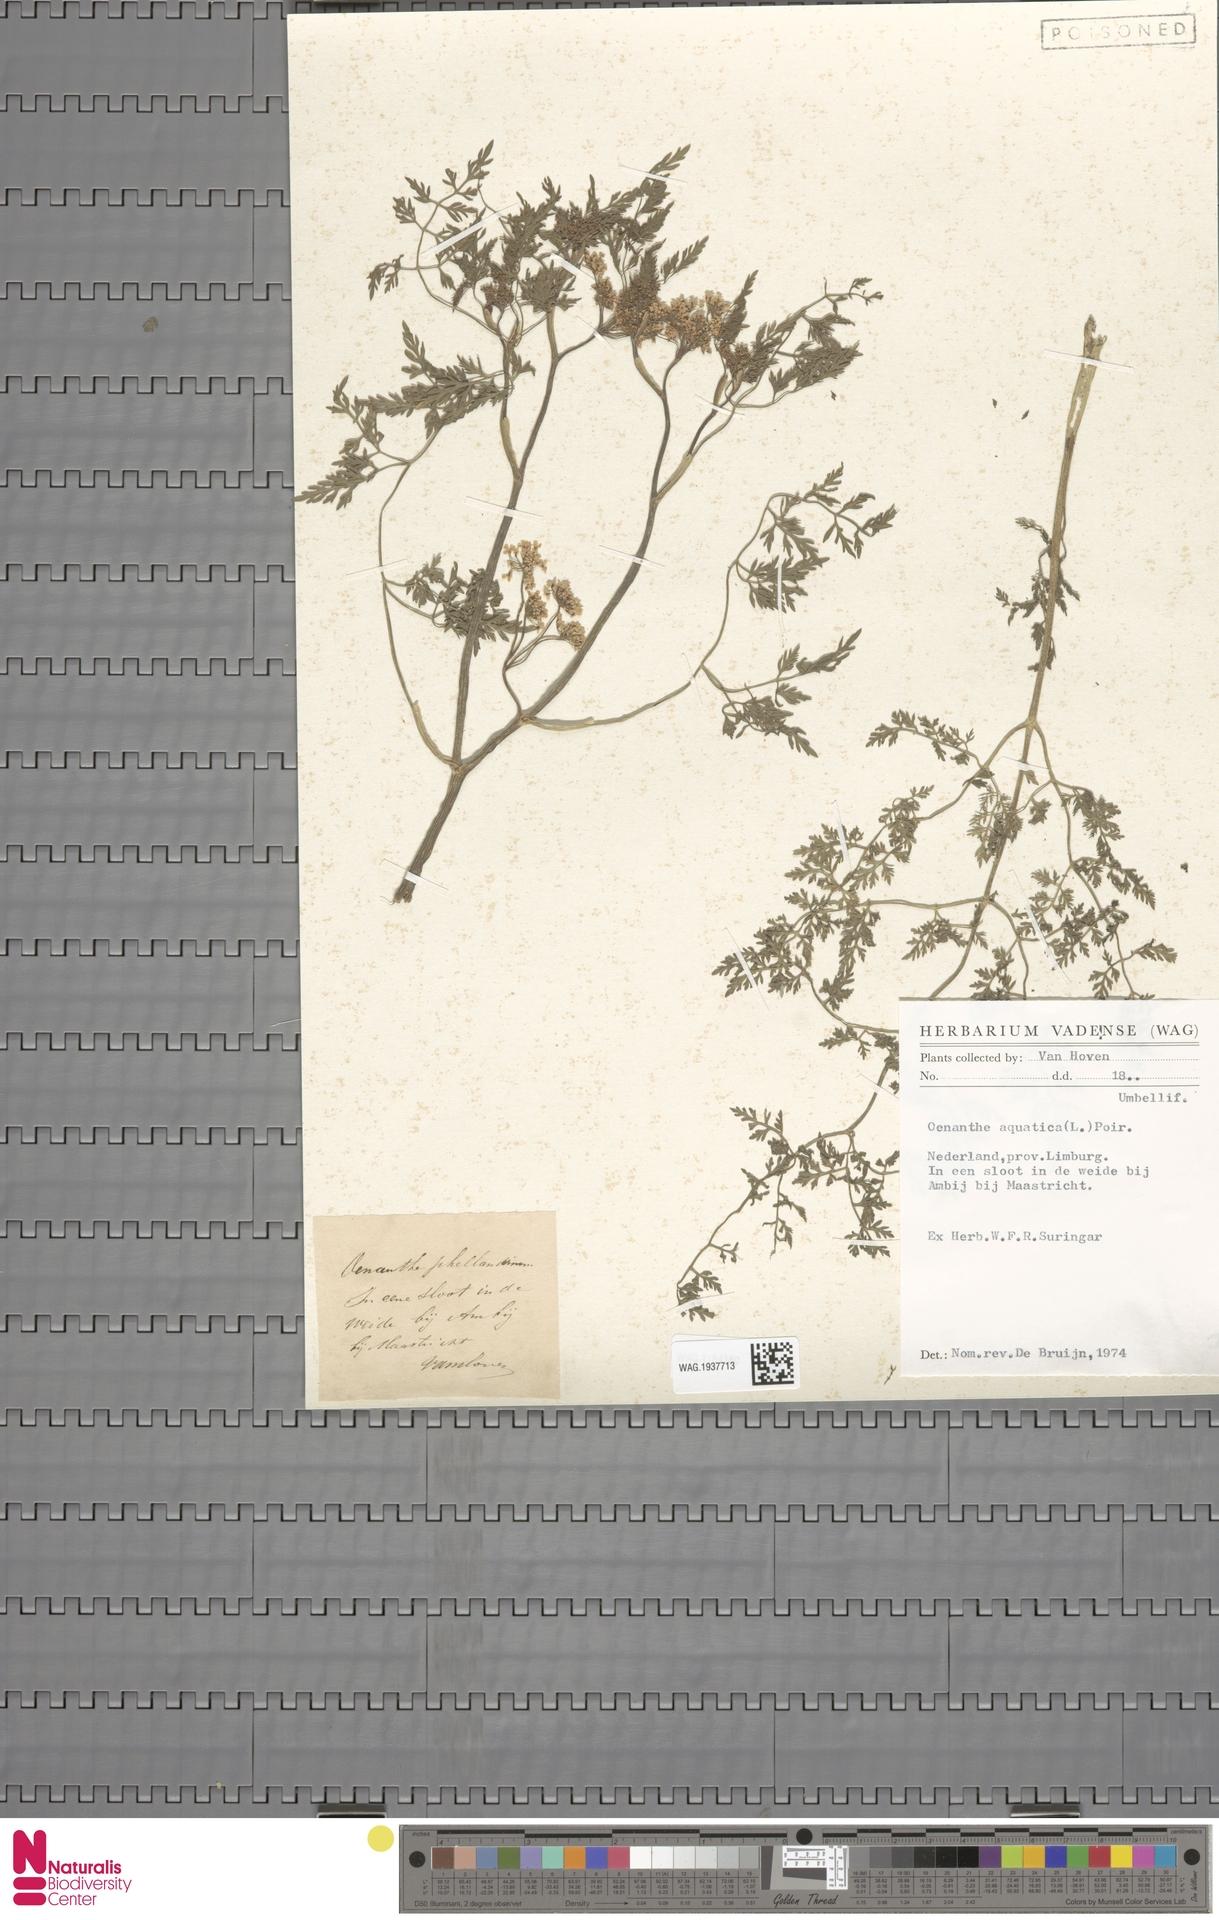 WAG.1937713   Oenanthe aquatica (L.) Poir.